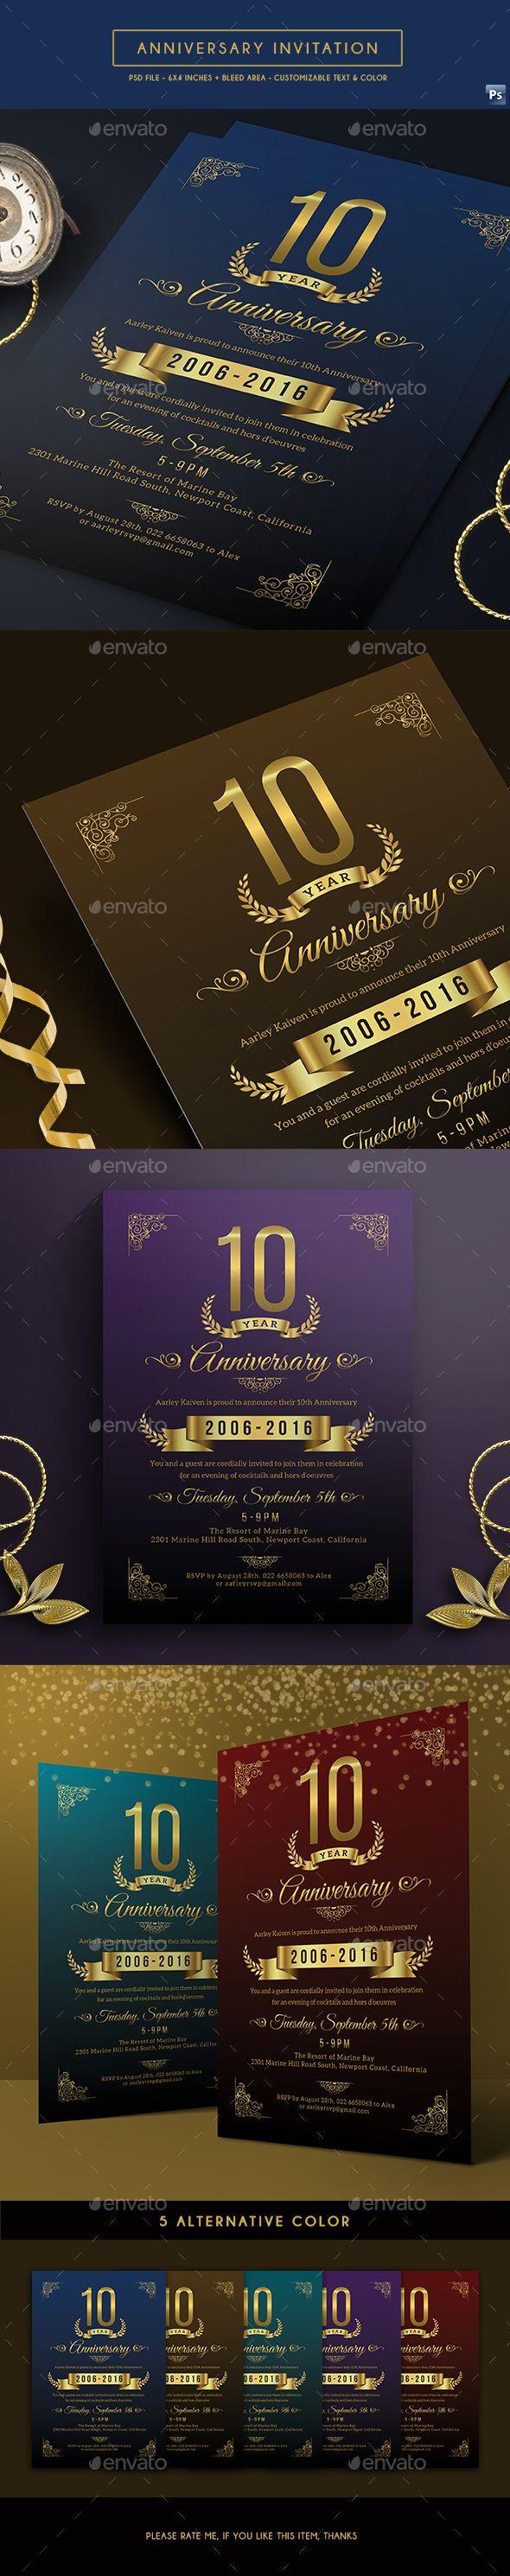 Anniversary Invitation Template PSD. Download here: https://graphicriver.net/item/anniversary-invitation/17546141?ref=ksioks